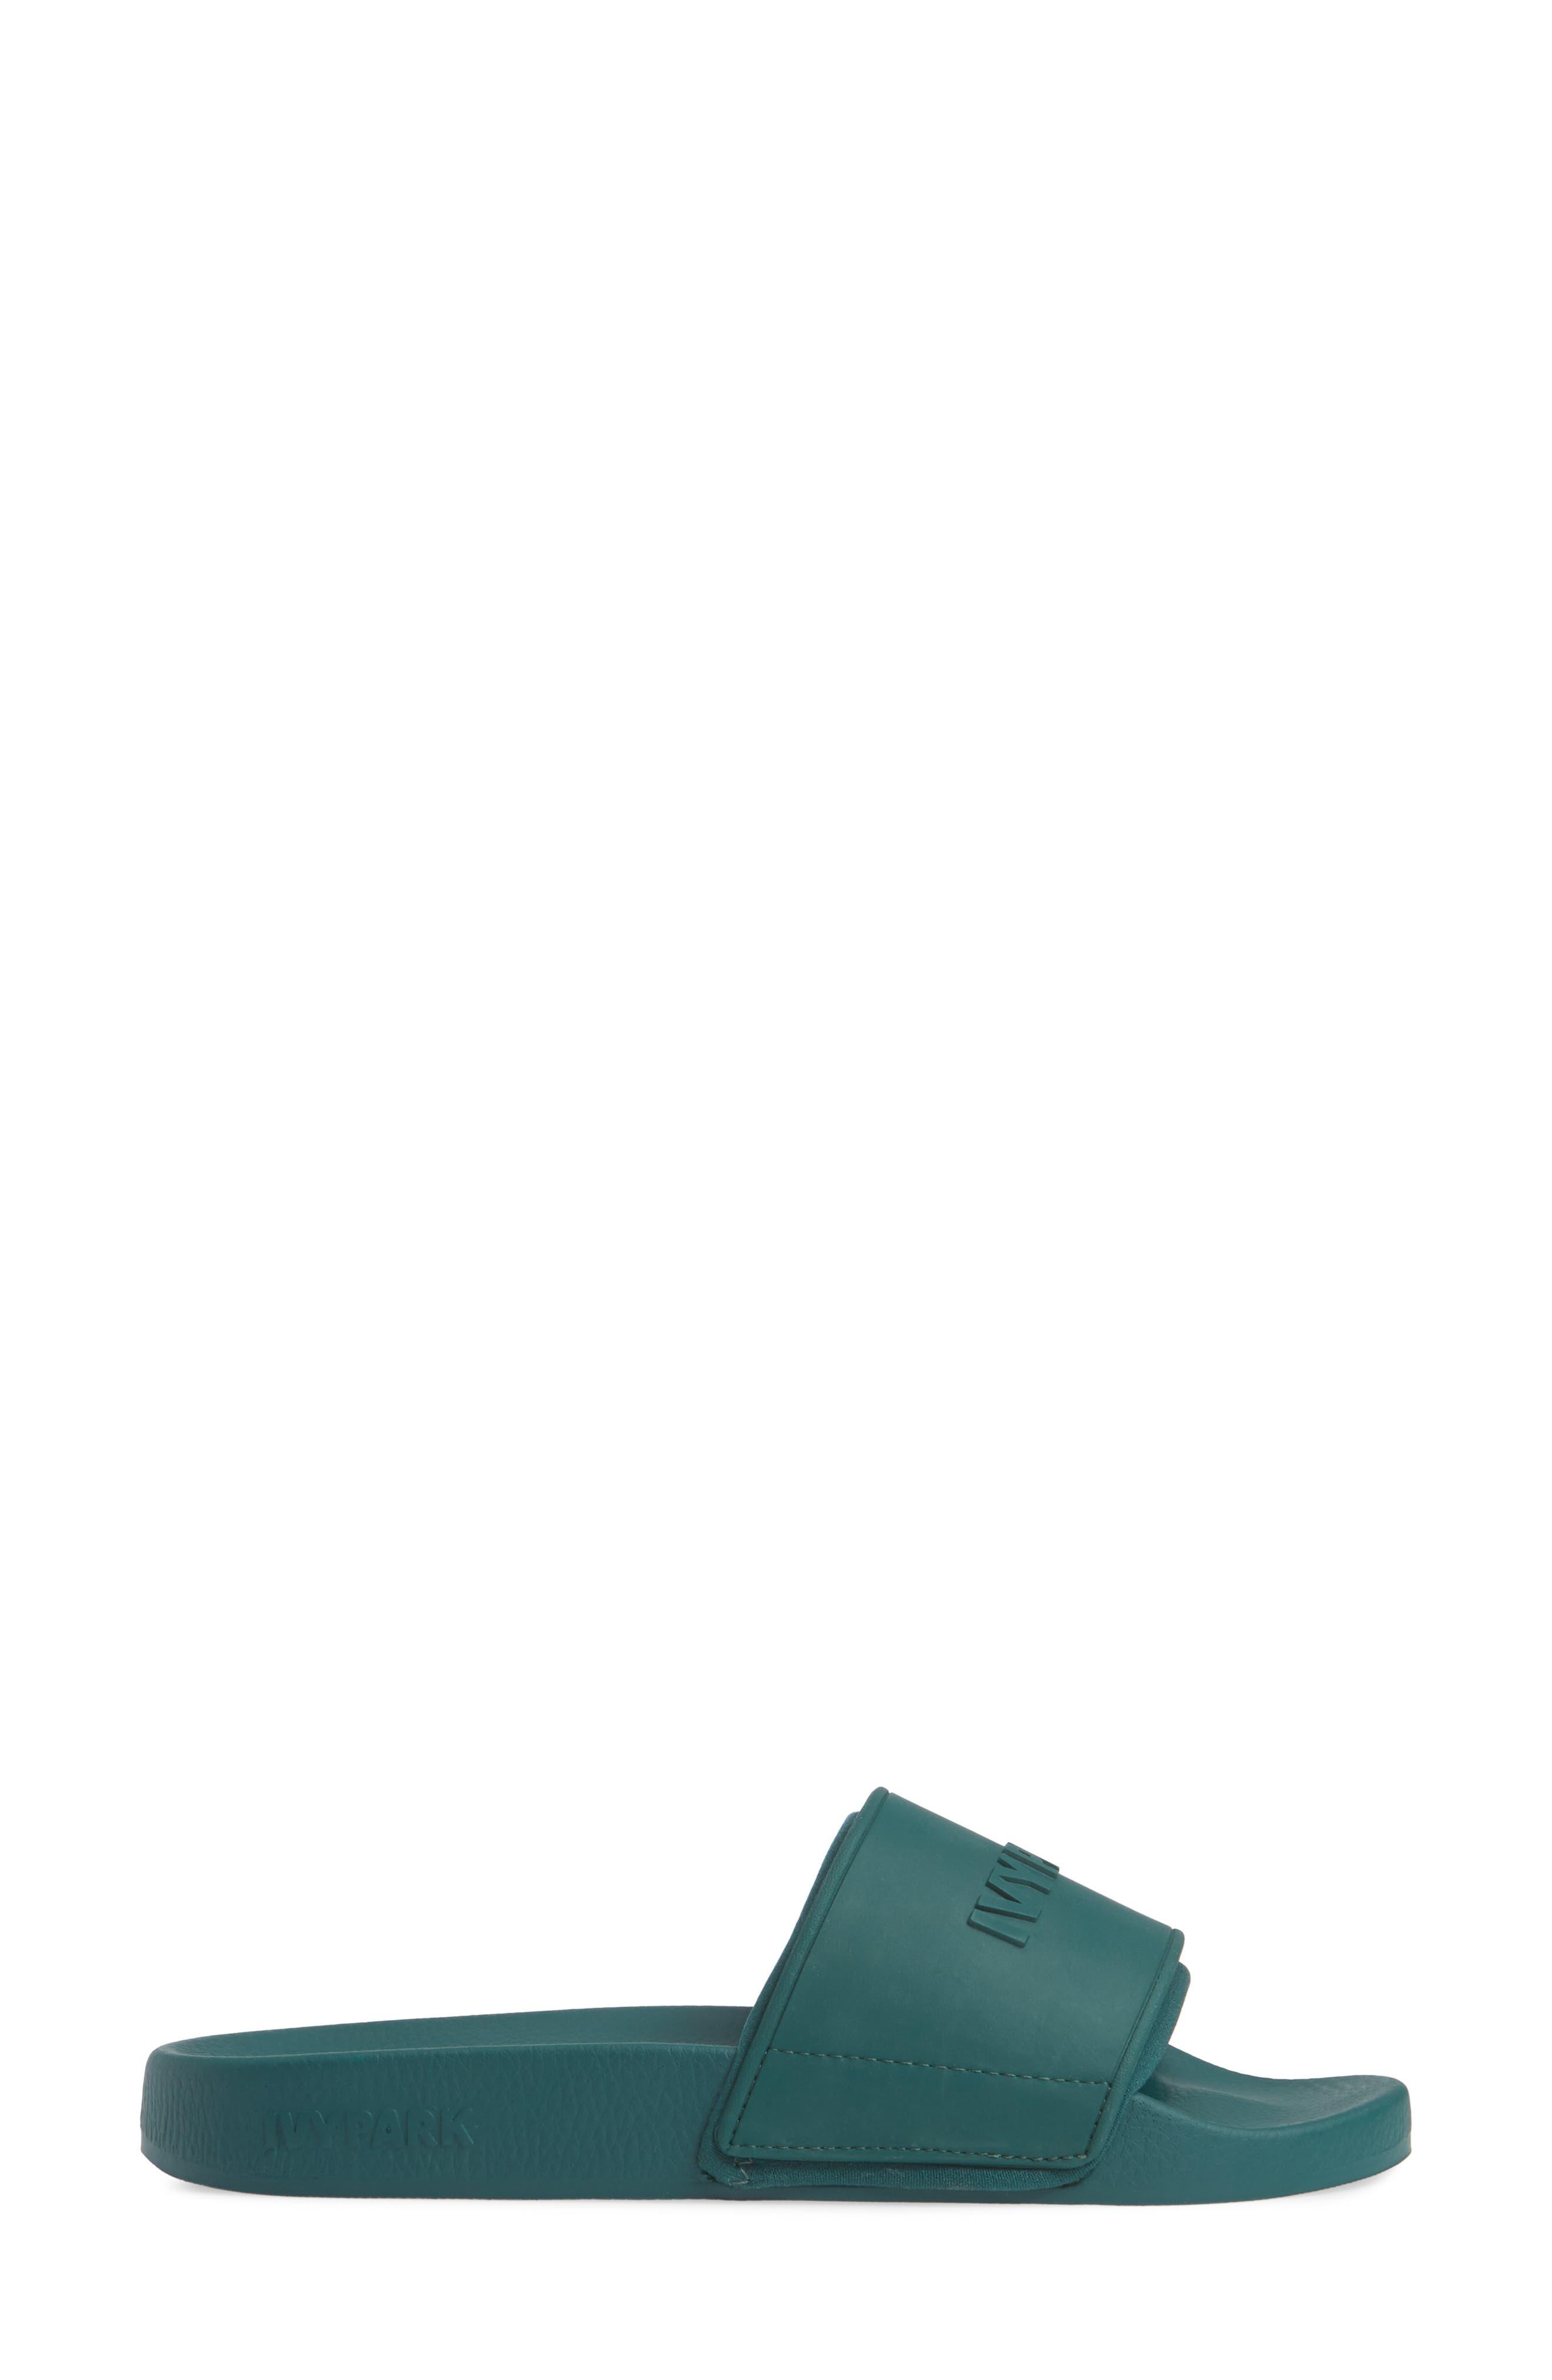 IVY PARK<SUP>®</SUP>, Embossed Logo Slide Sandal, Alternate thumbnail 3, color, 300